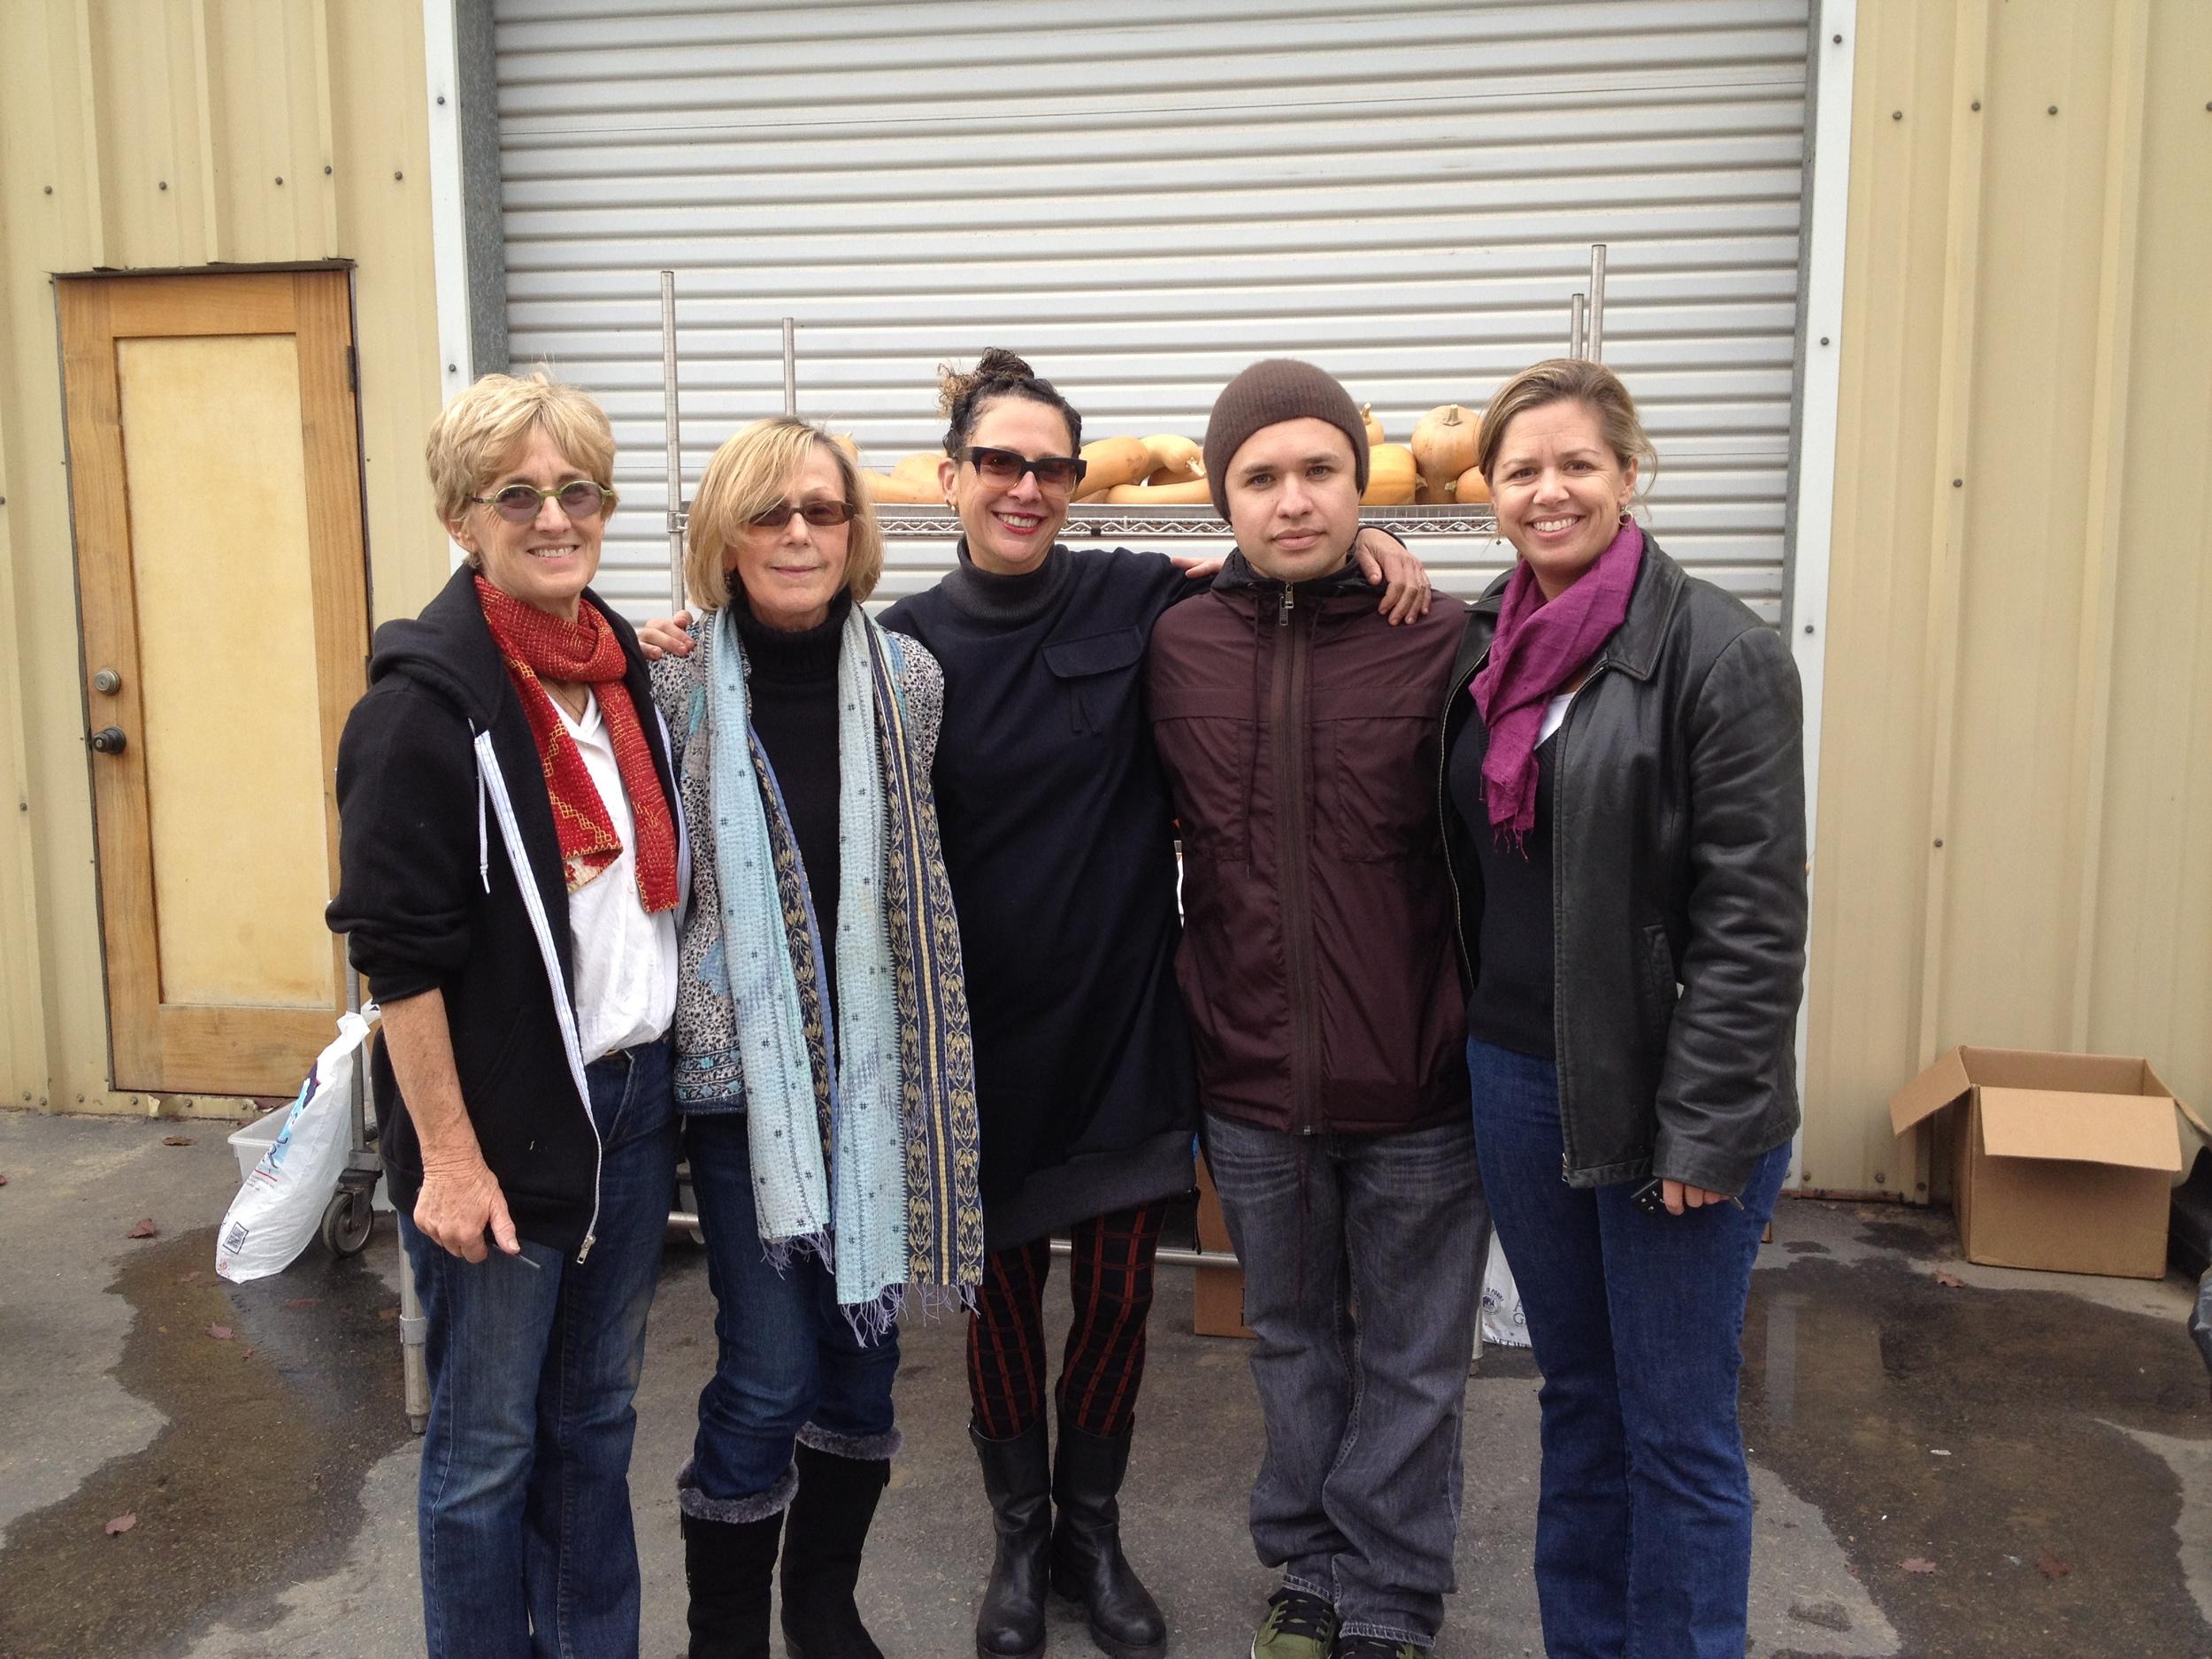 From L to R, Nina MacConnel, Milane Christiansen, Nancy Silverton, Matt Molina, and Jennifer de la Fuente